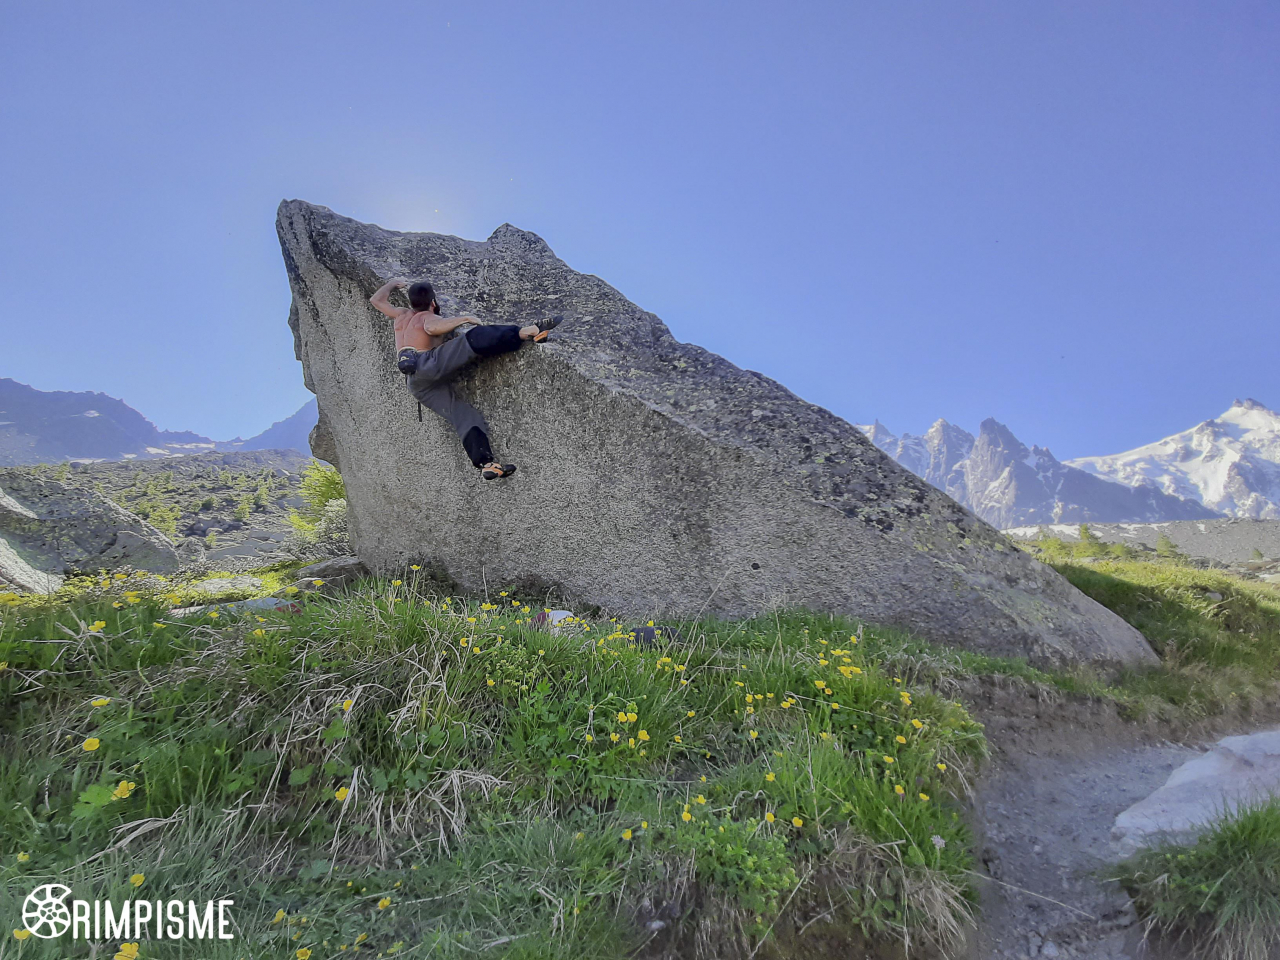 A picture from Aiguille du Midi by Fred Vionnet Grimpisme